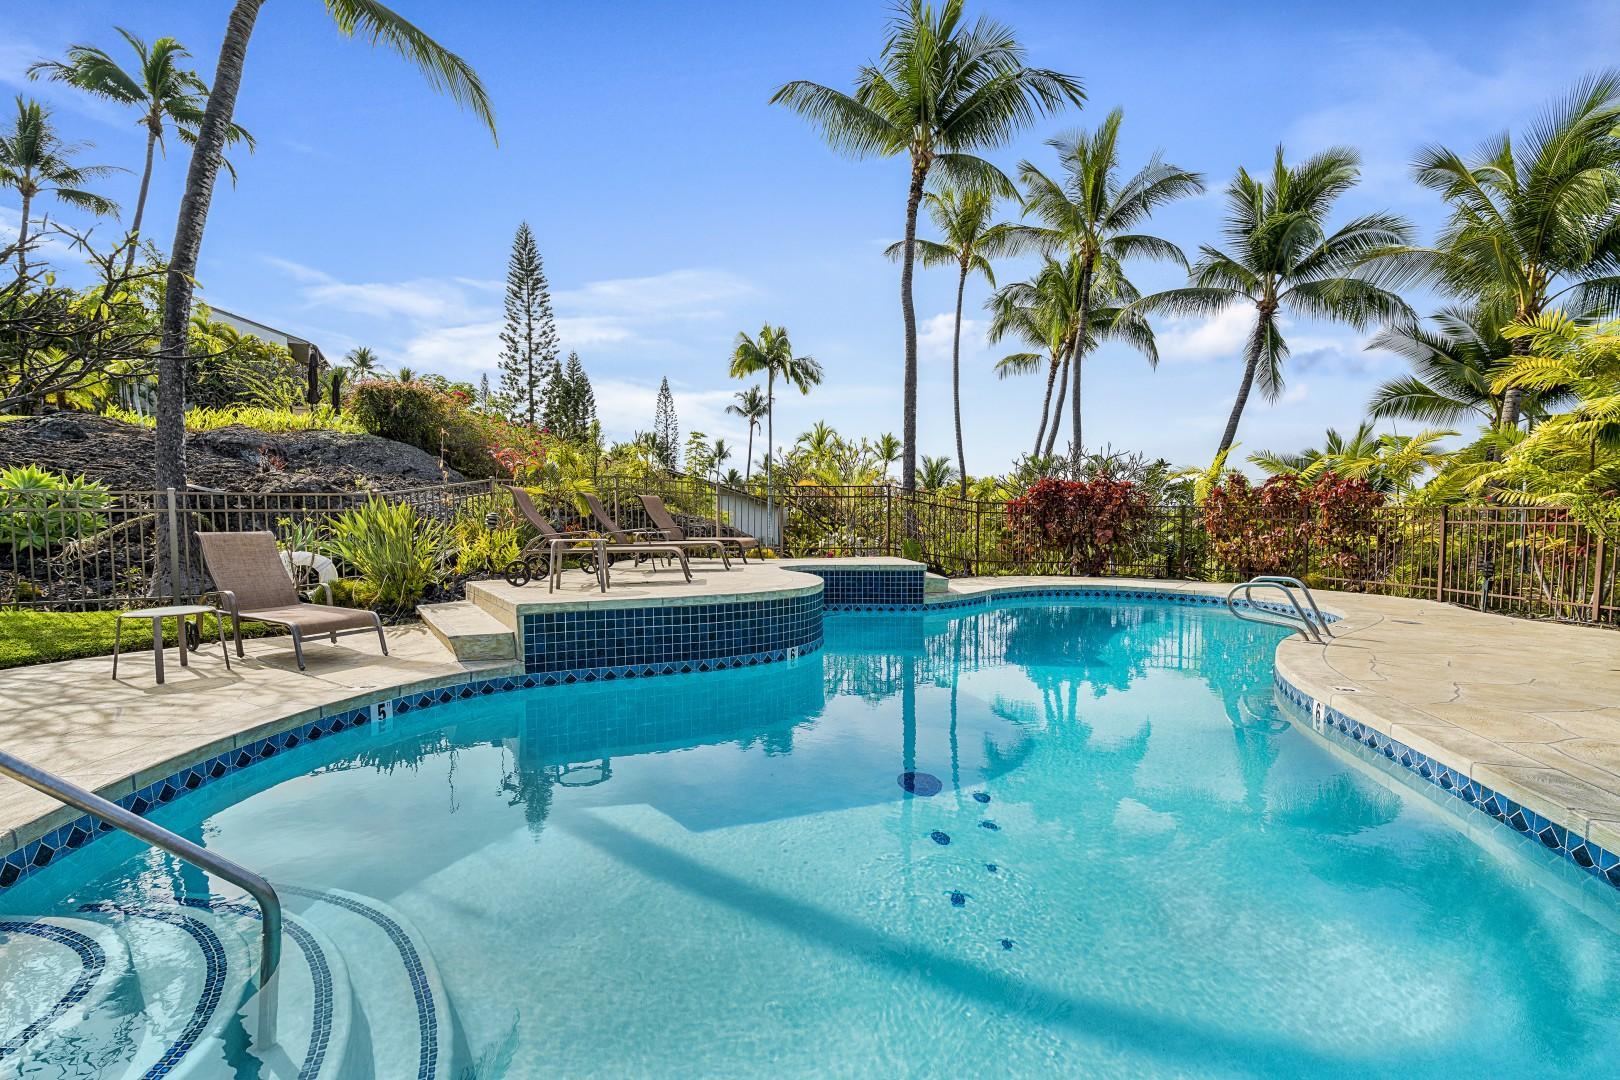 Keauhou Resort Pool